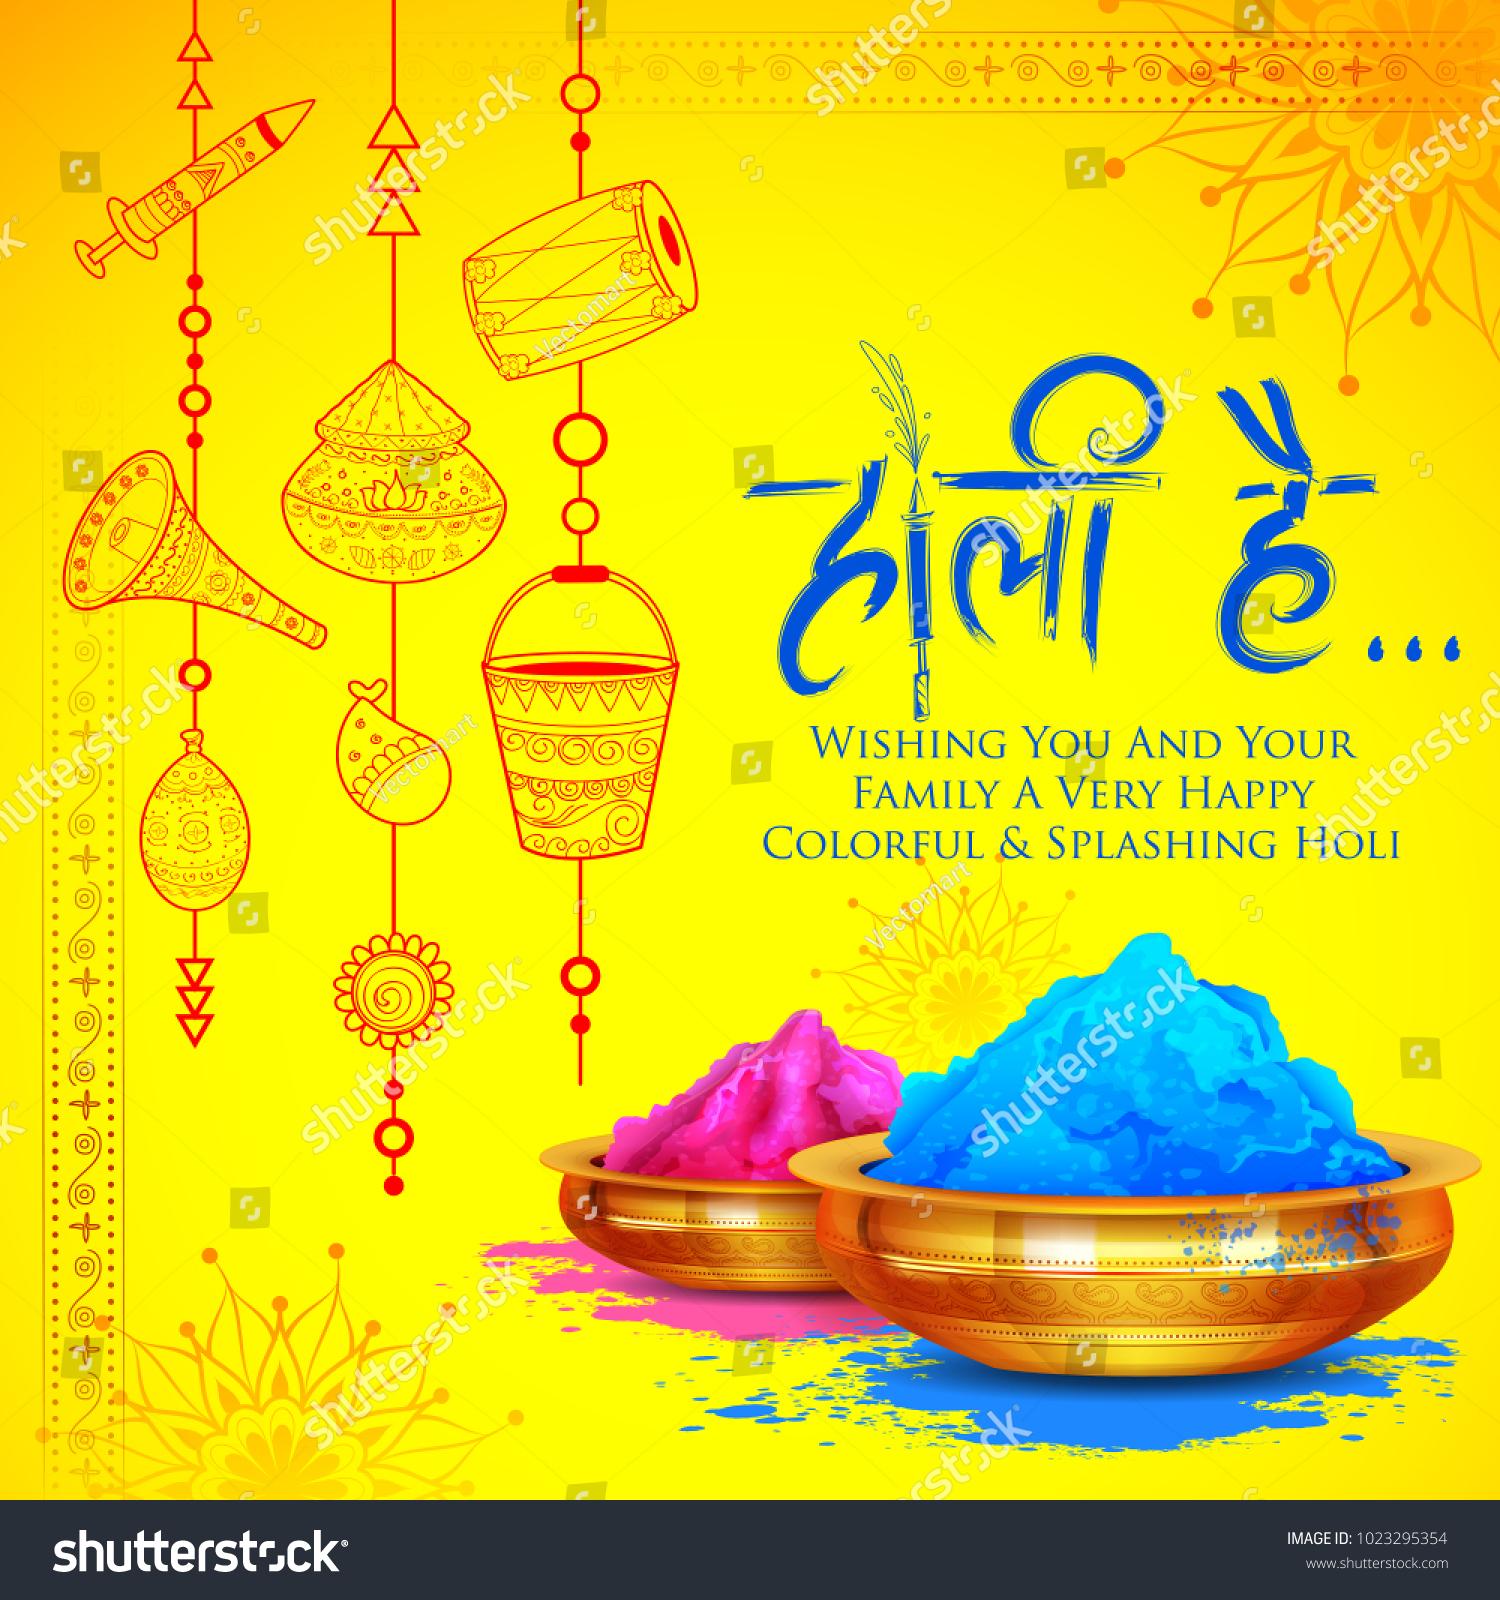 Illustration Colorful Promotional Background Festival Colors